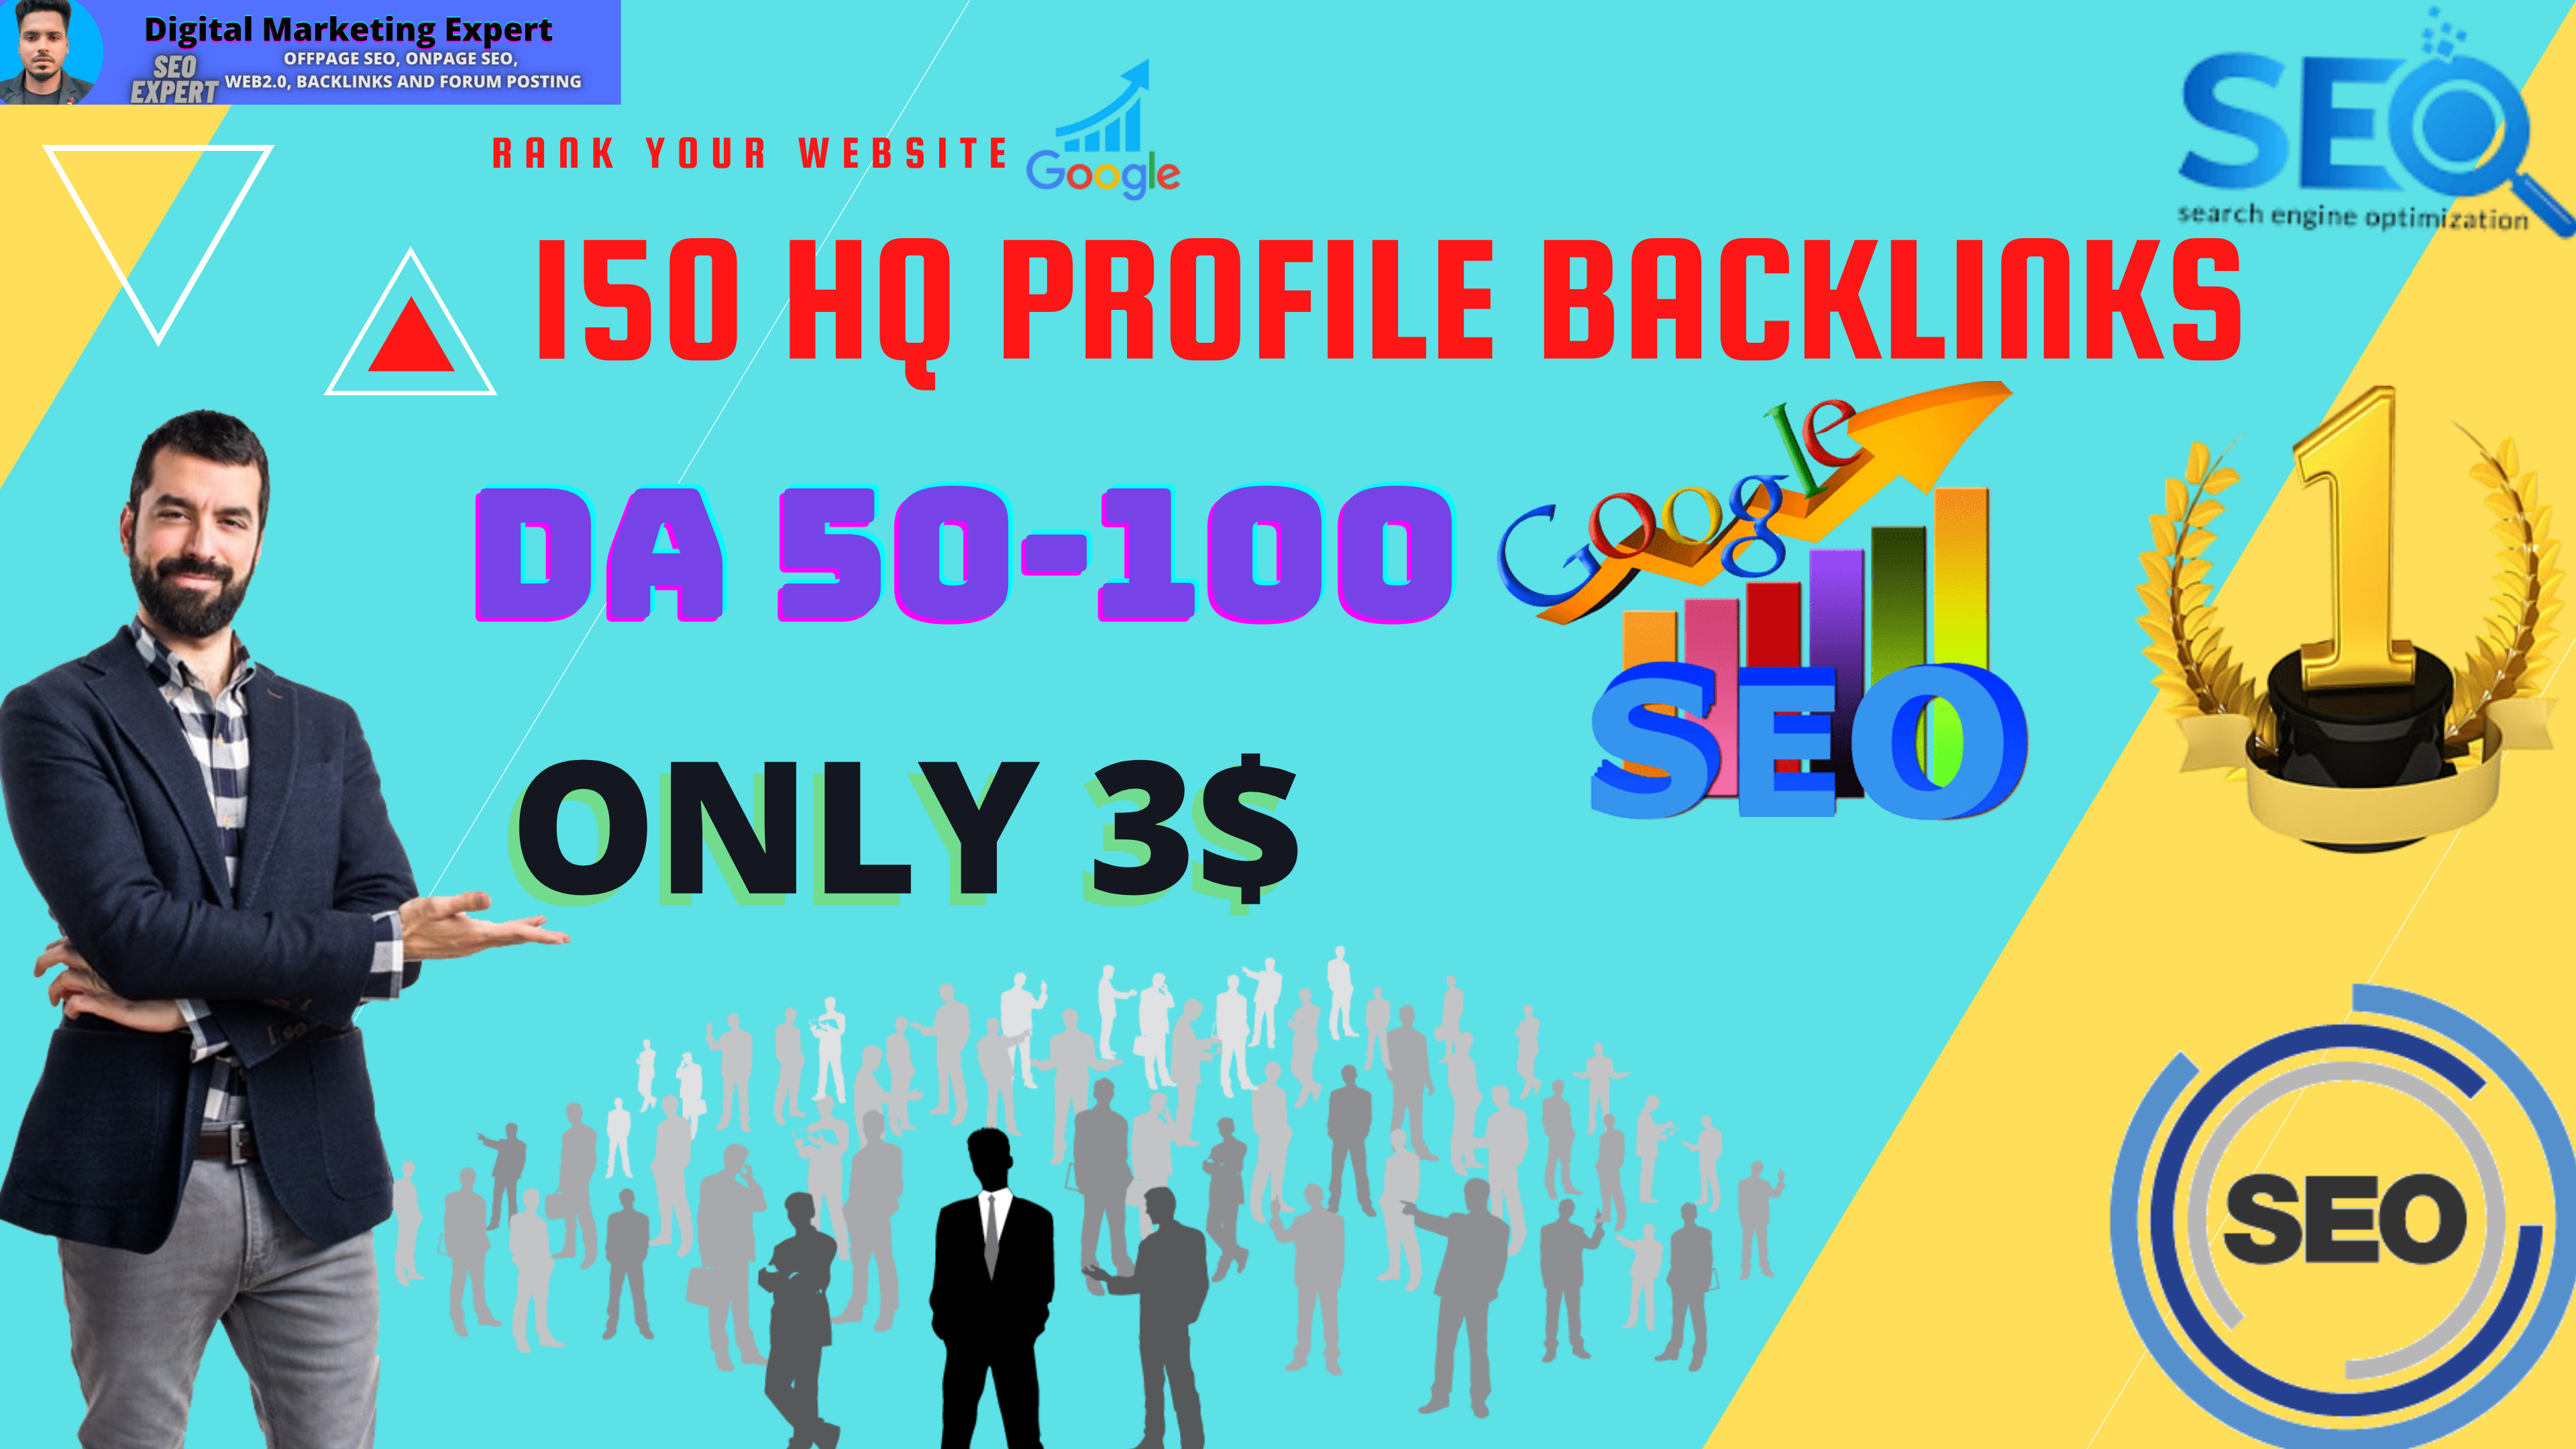 I will Create 150 High DA Profile Backlinks Manually for SEO Ranking Your Website